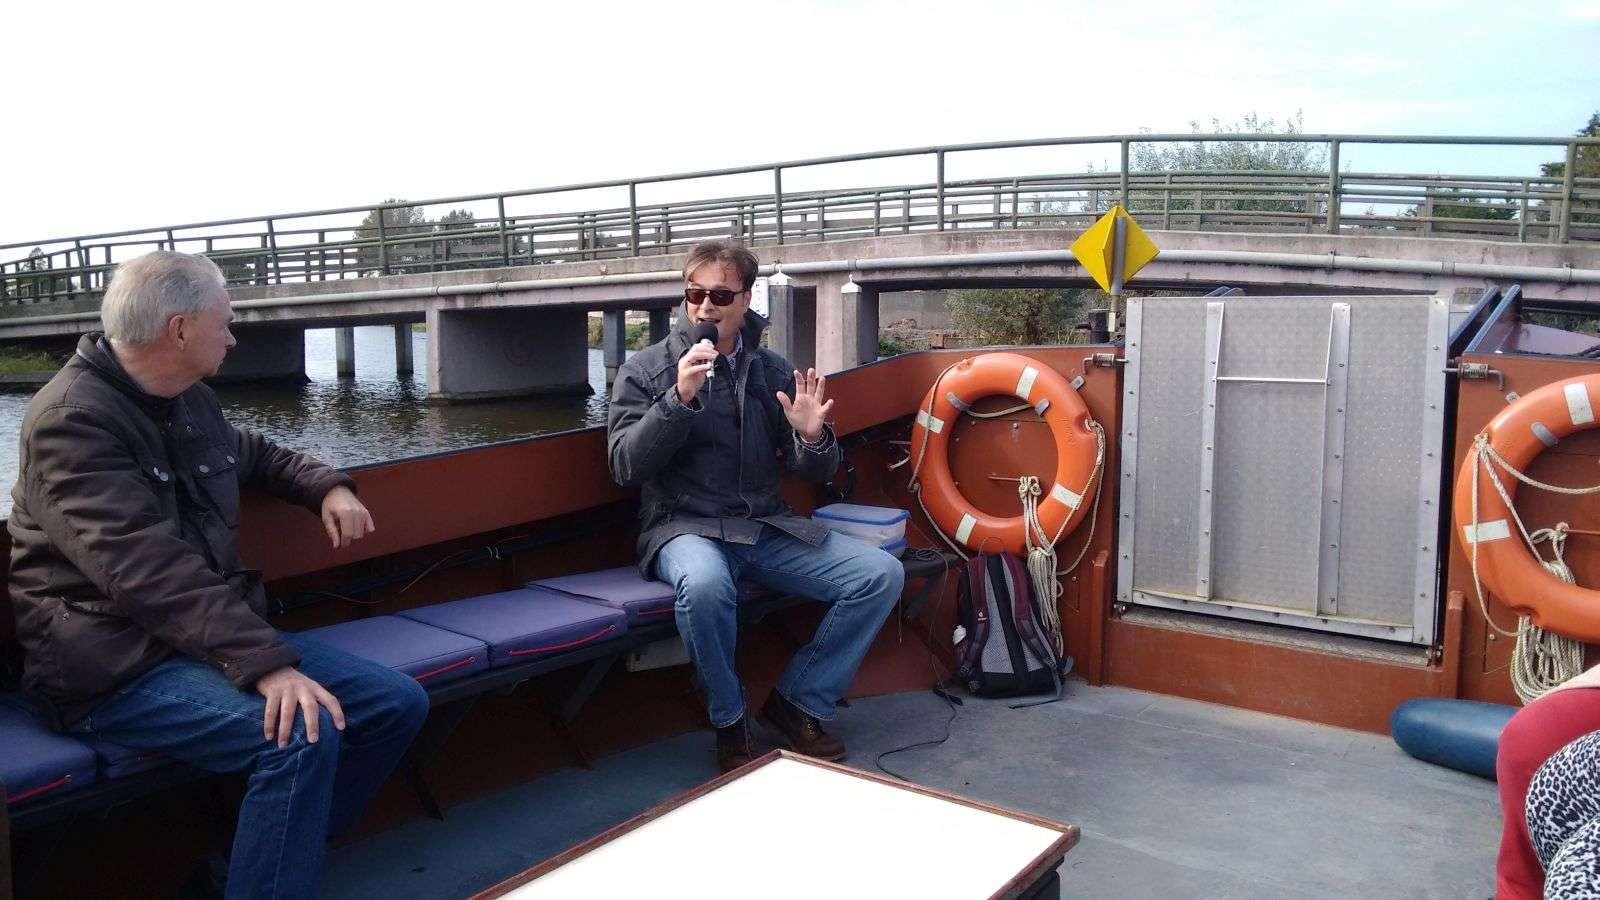 http://uvv-zoetermeer.nl/wp-content/uploads/2017/03/IMG_20161014_133550068-1.jpg